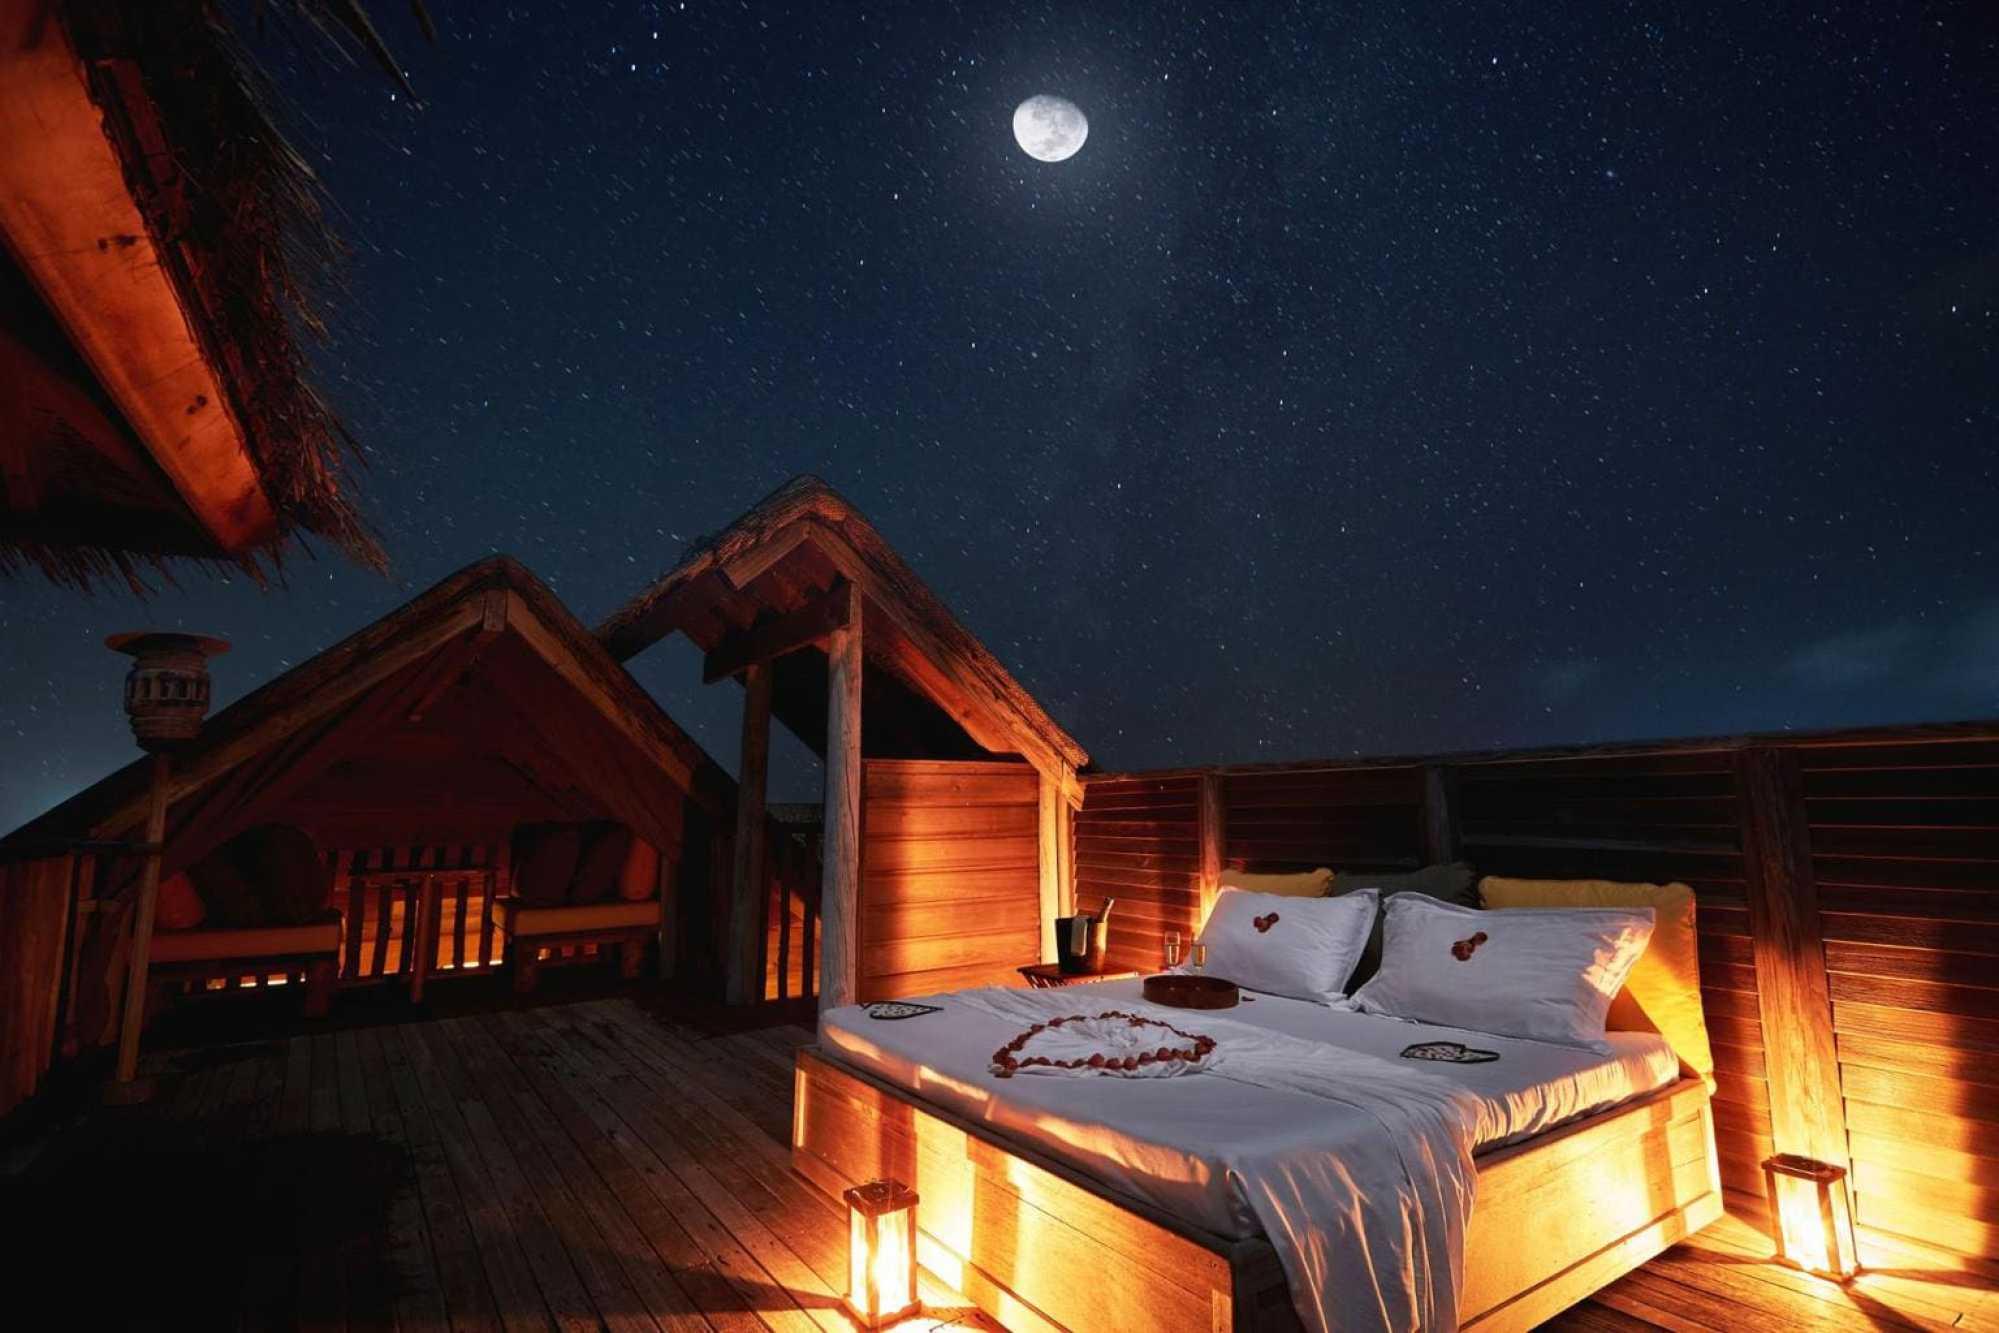 Sleeping under the stars at Gili Lankanfushi